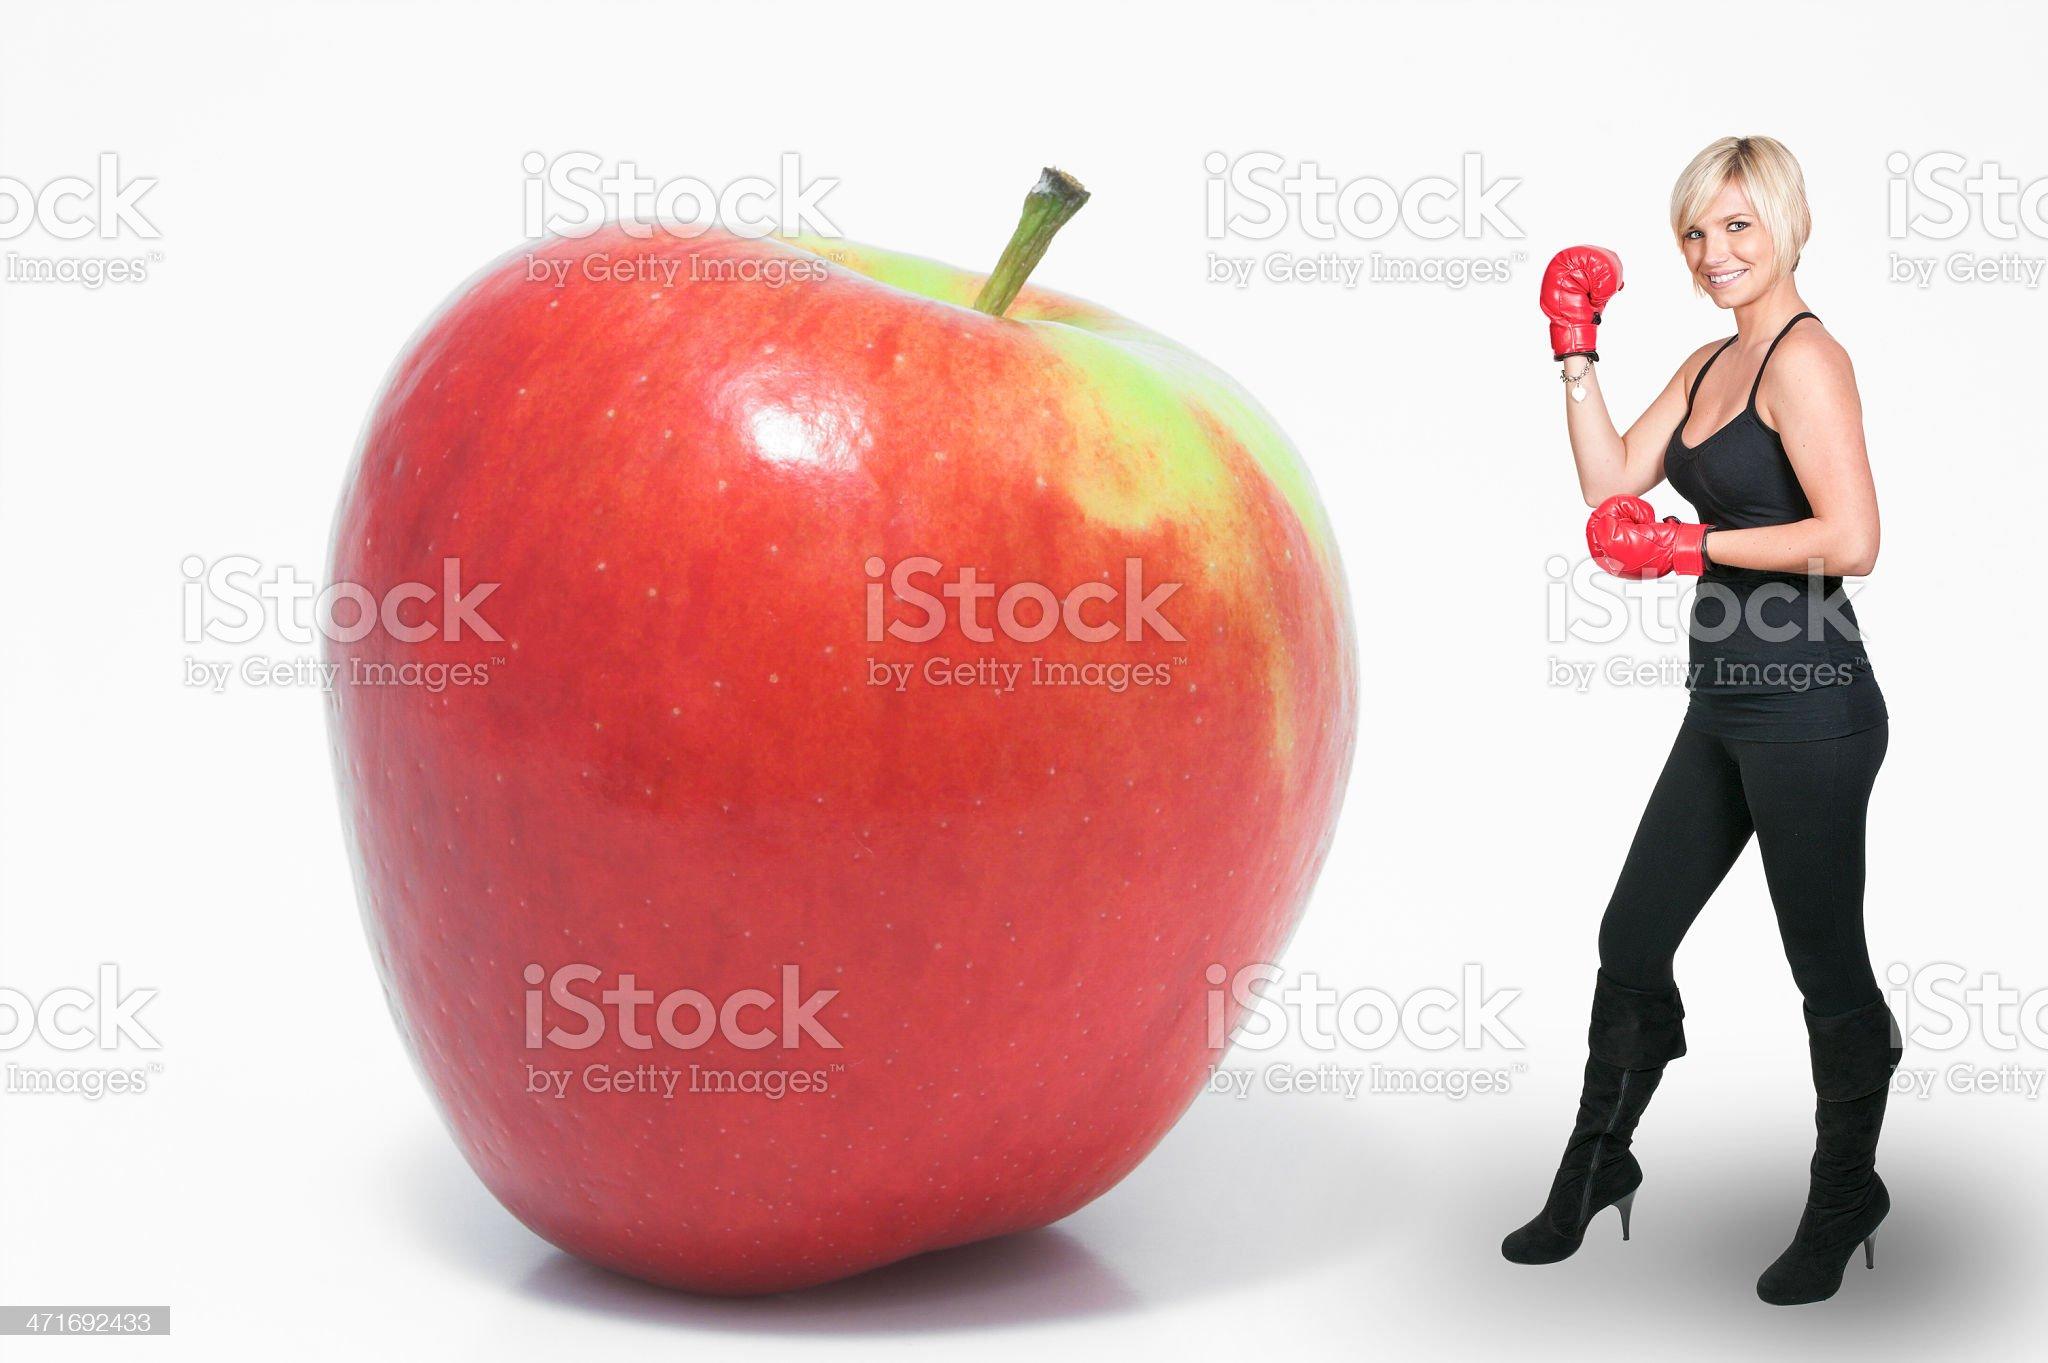 Boxing Apple royalty-free stock photo